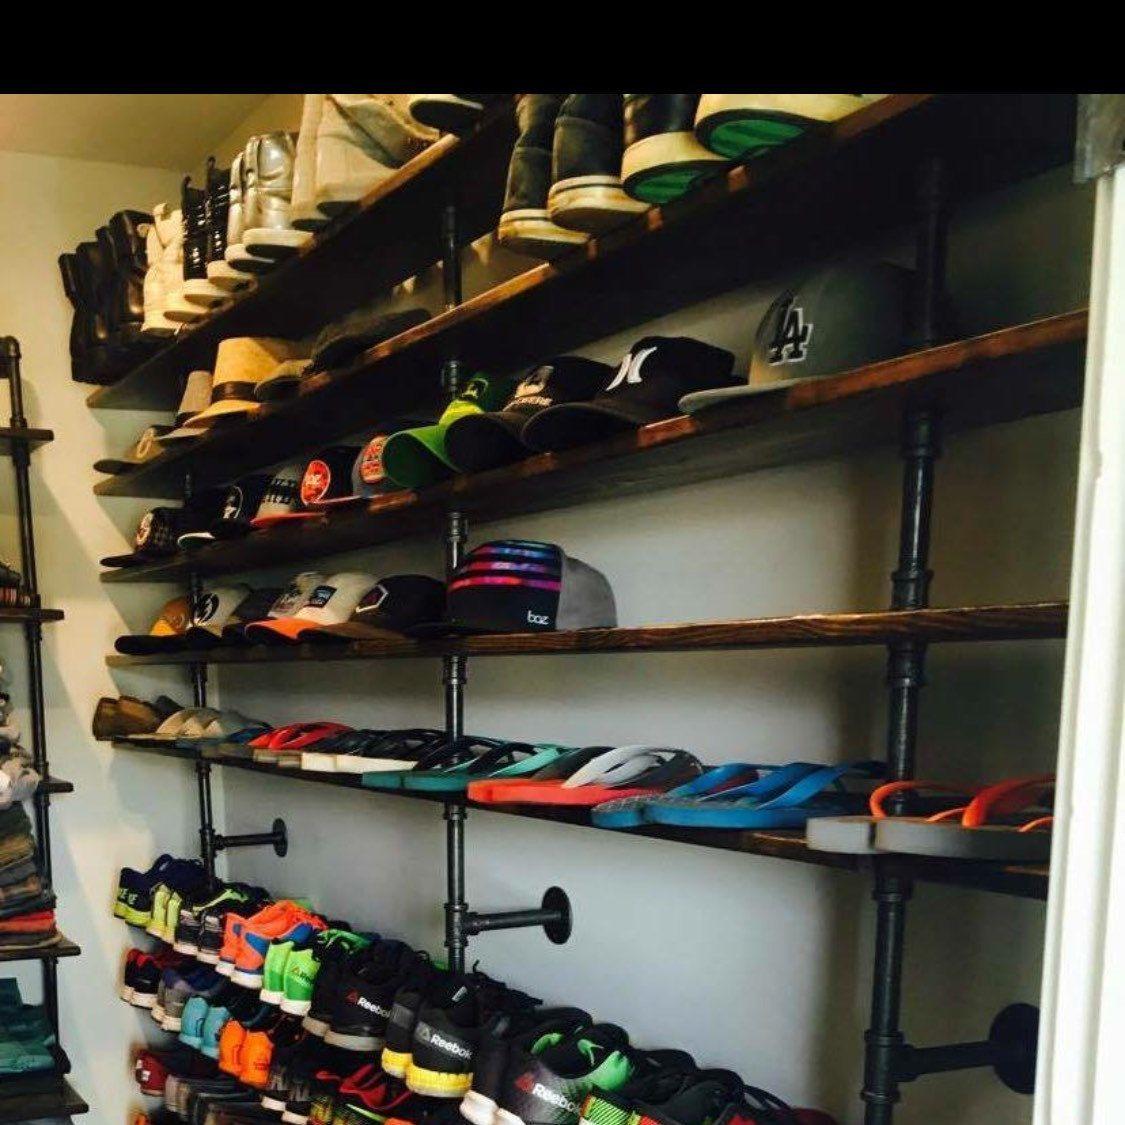 Shoe Rack Industrial Shelf Industrial Rack Shoe Organizer Clothes Rack Closet Organizer Garment Rack Store Shelves Shoe Rack Wakeboarding Surfing